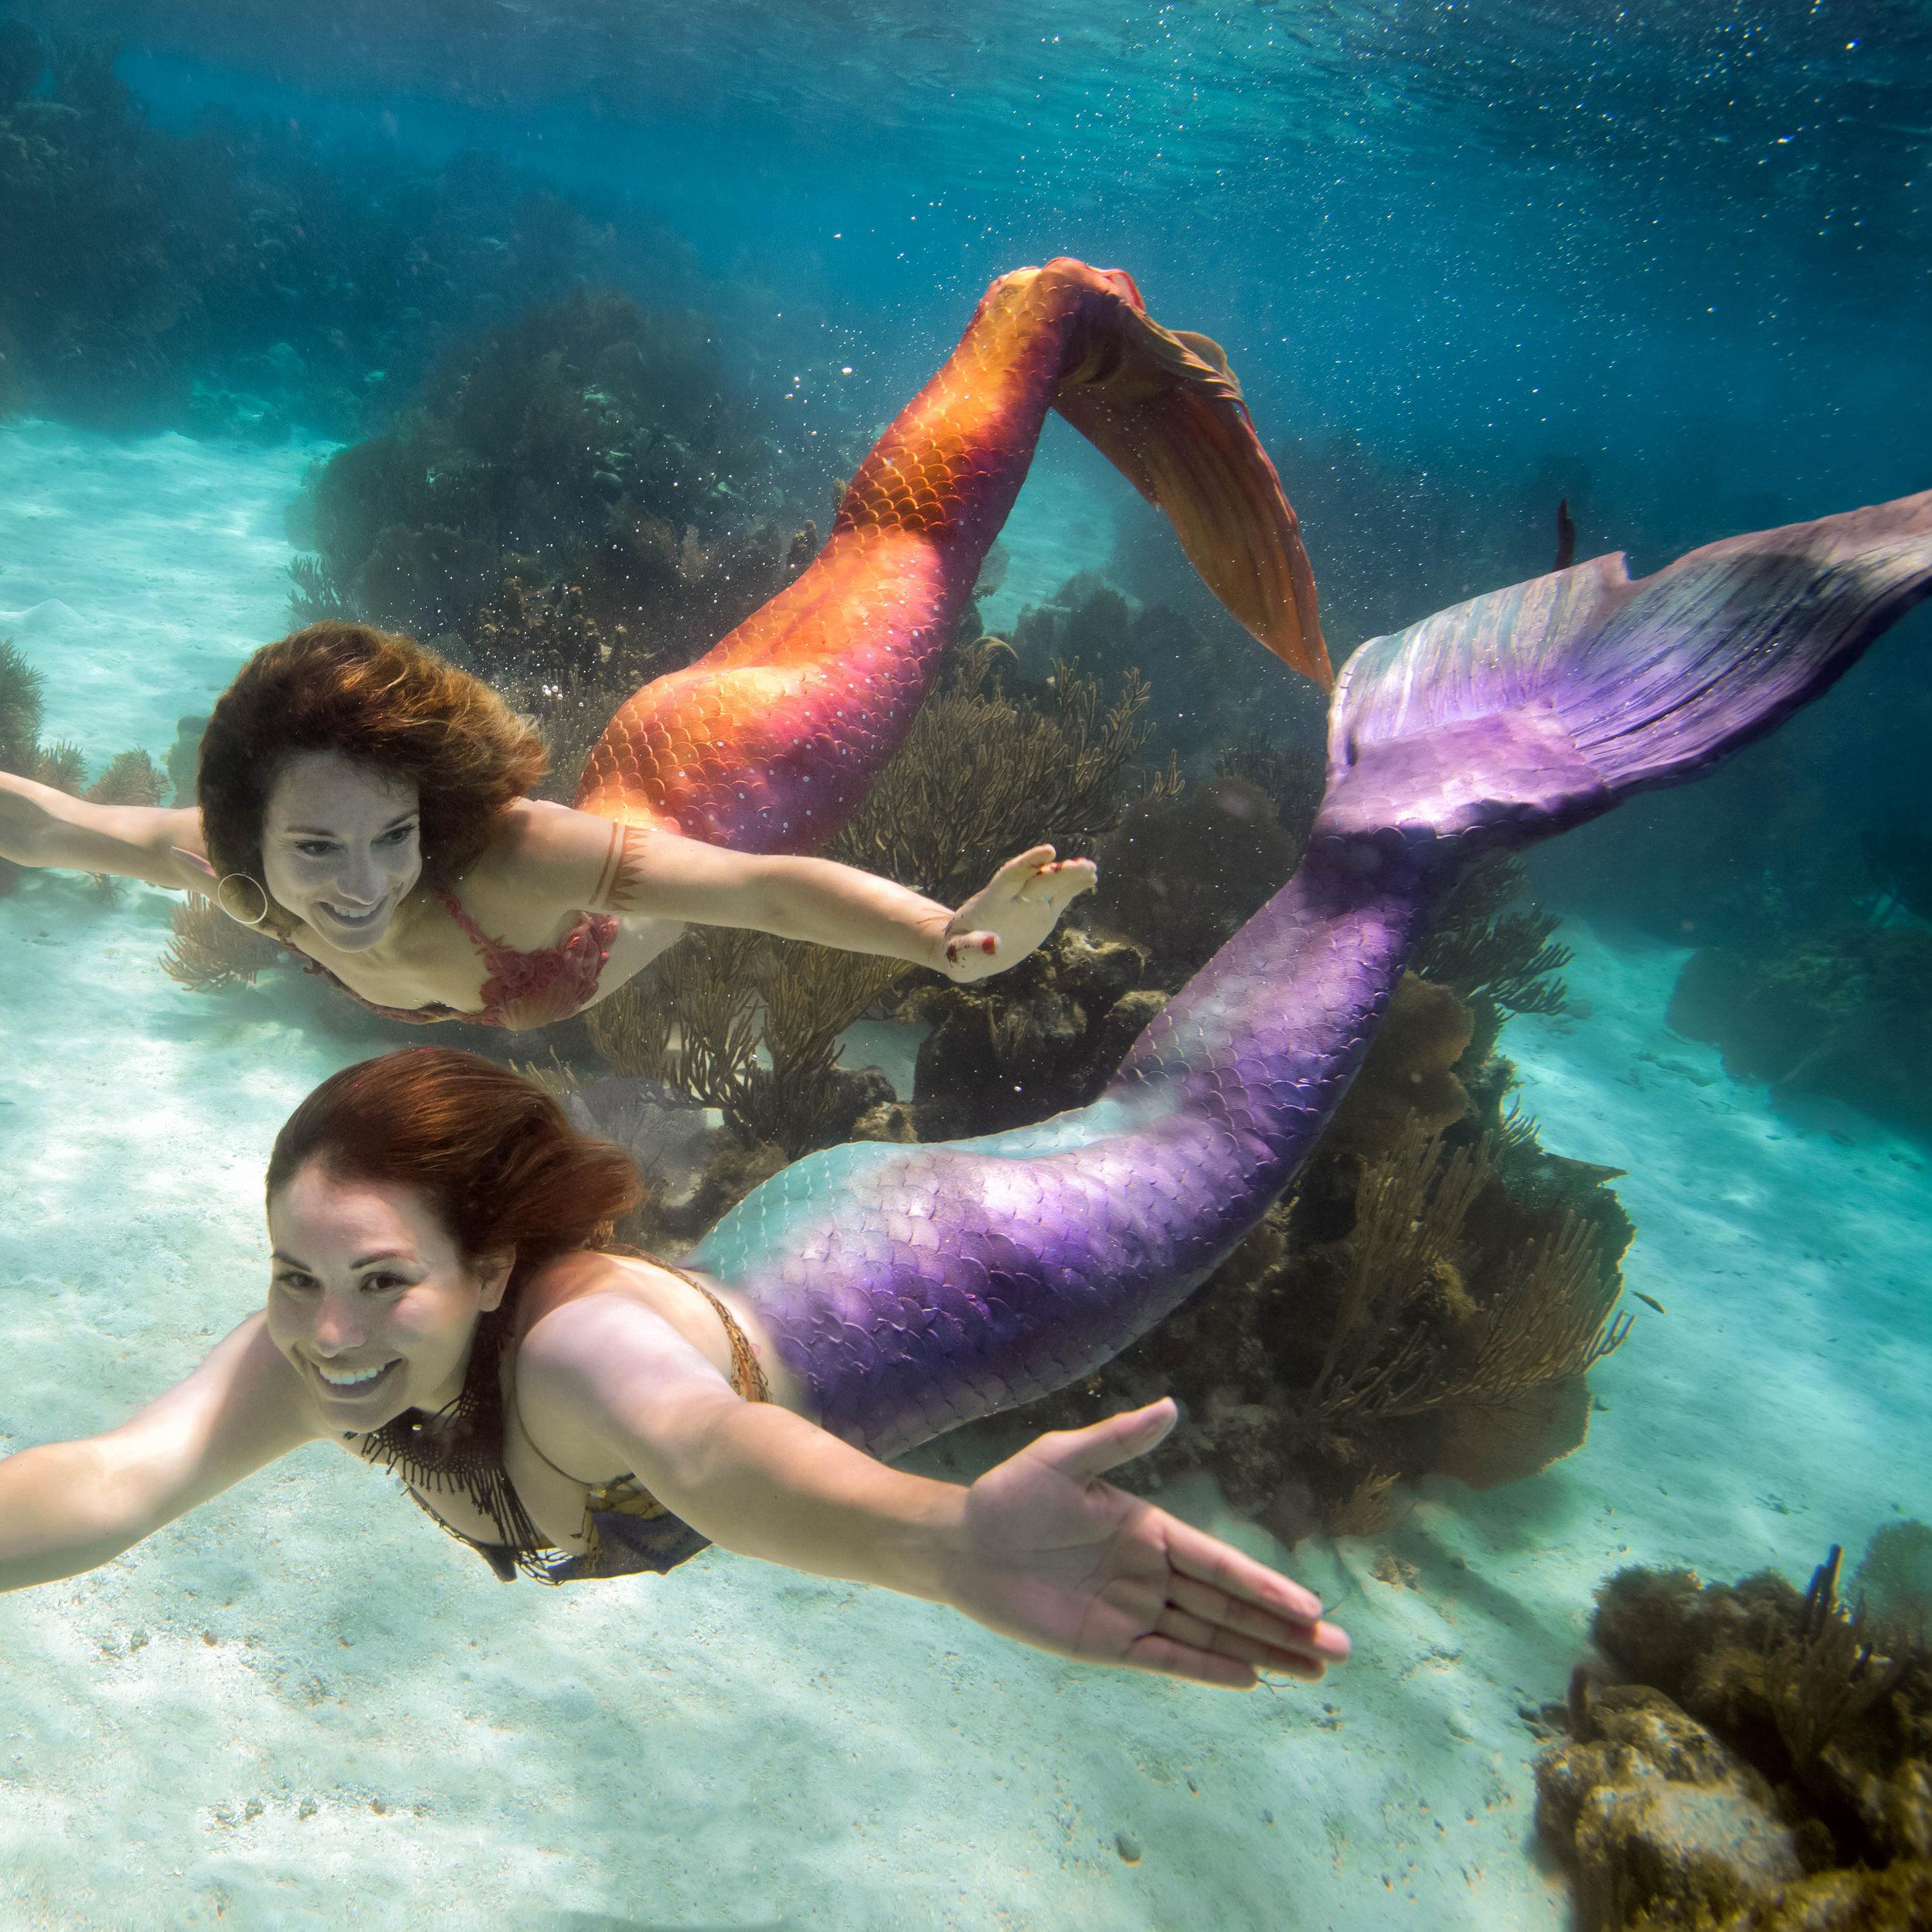 real live mermaids